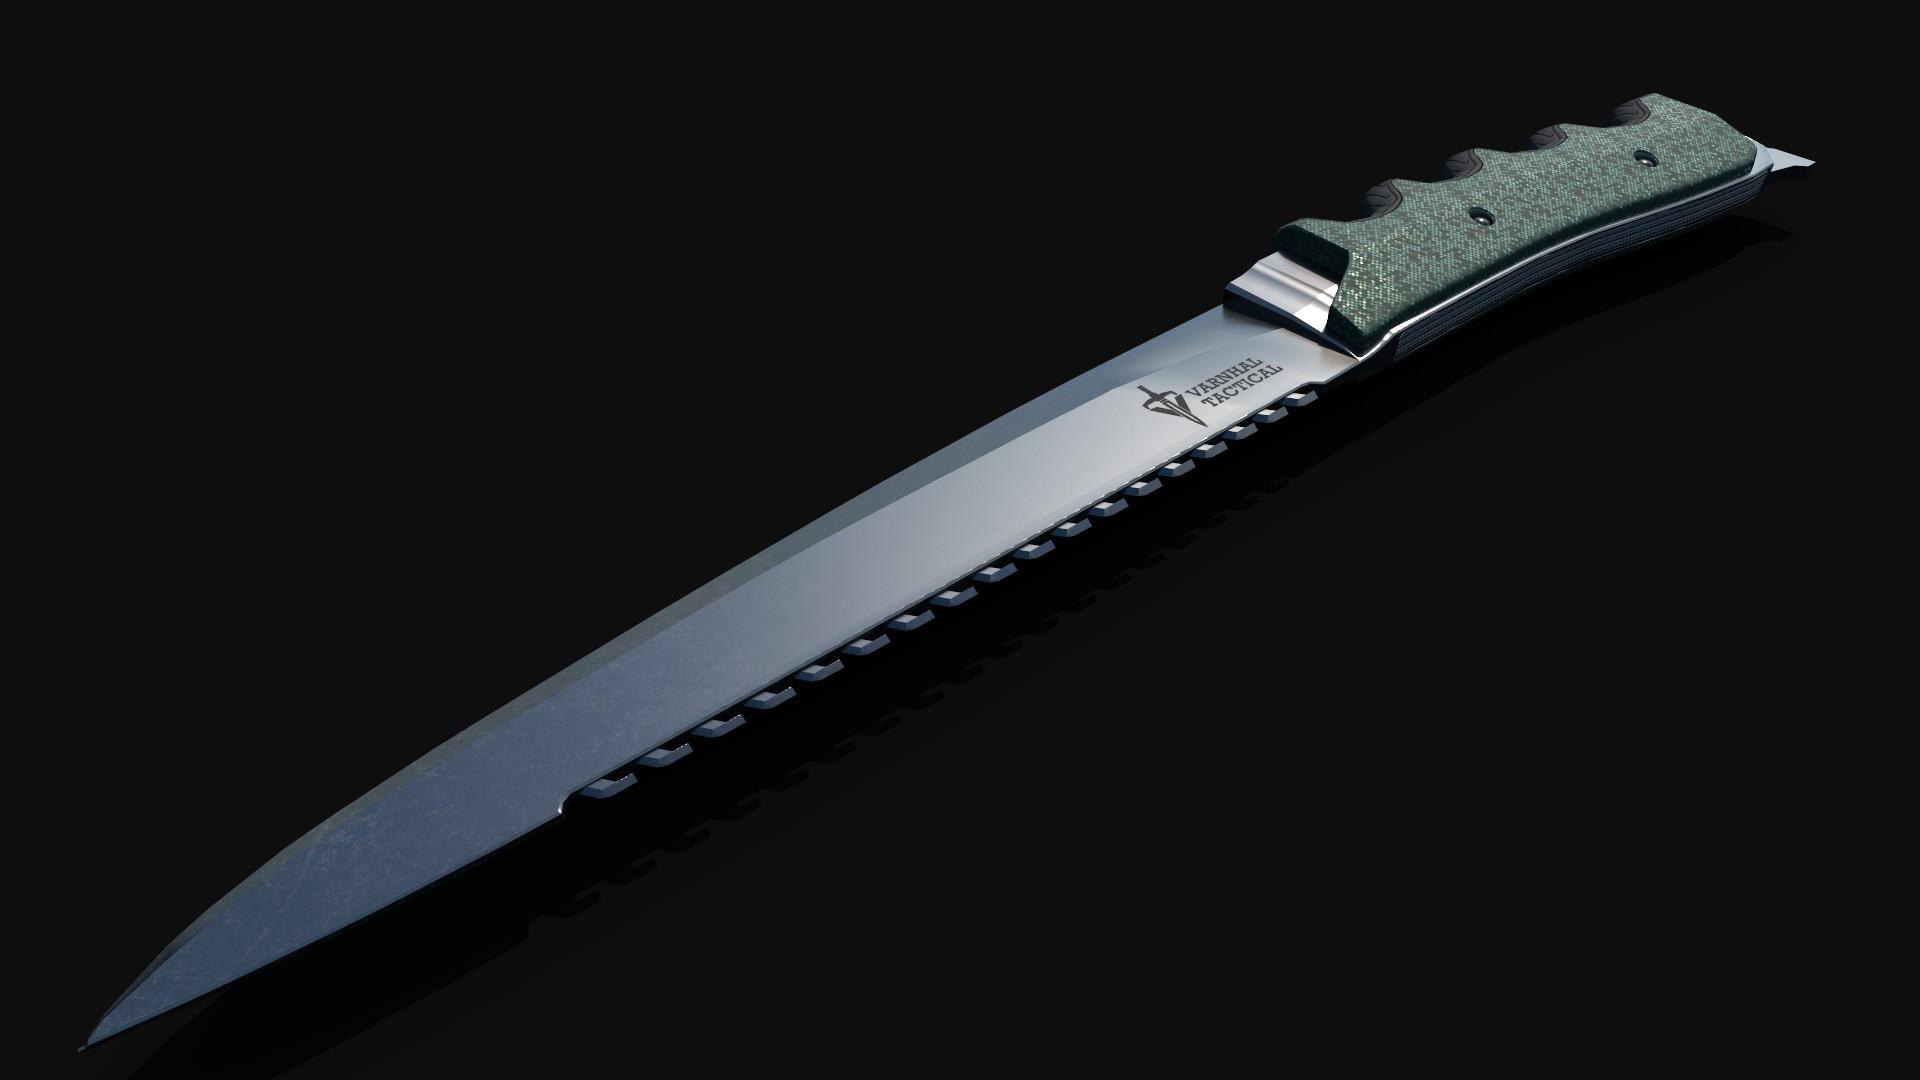 CombatKnife_2.jpg